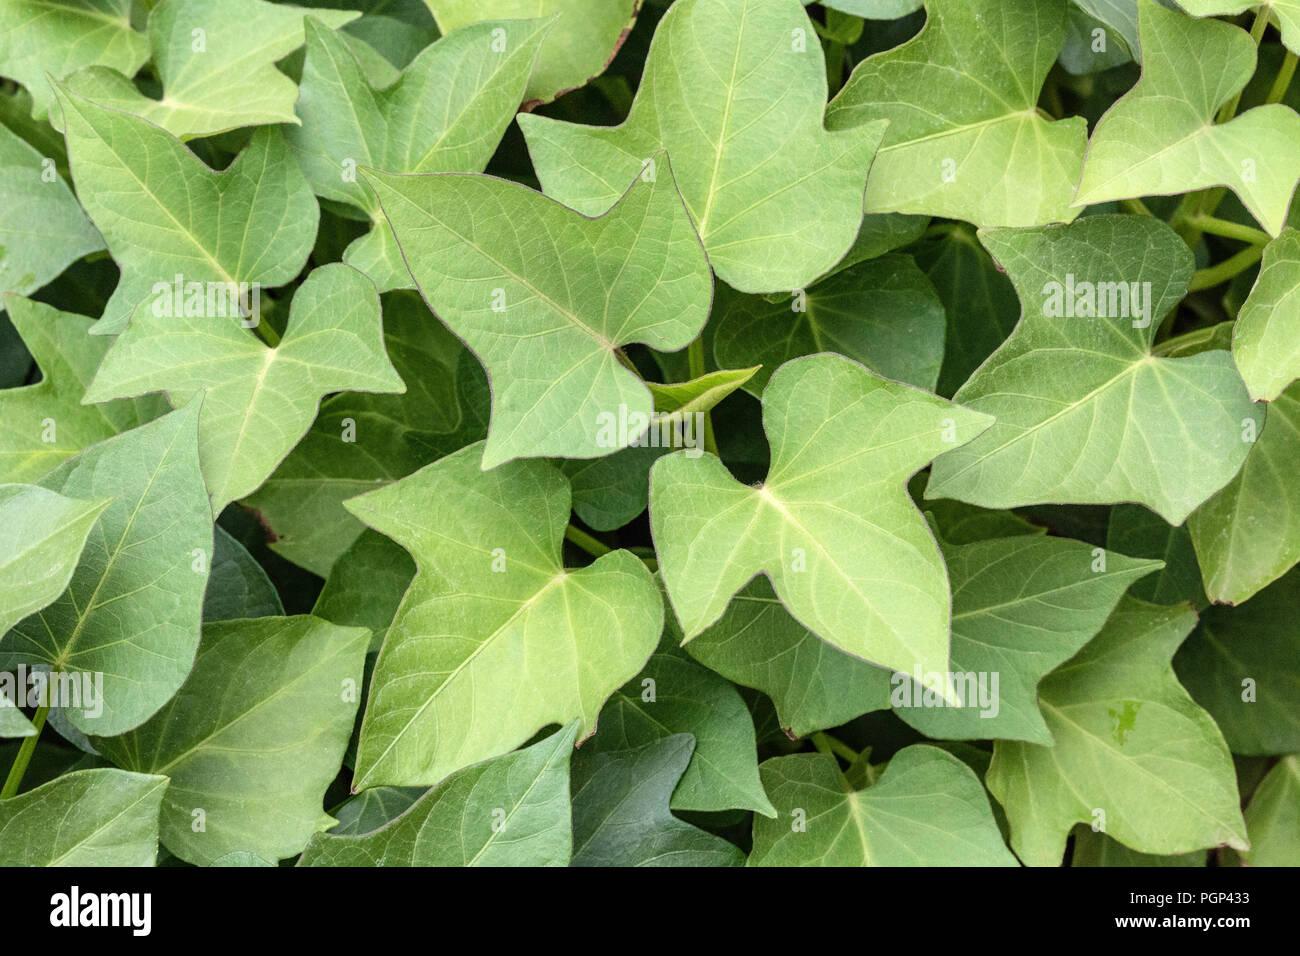 Sweet potato leaf Photo Stock